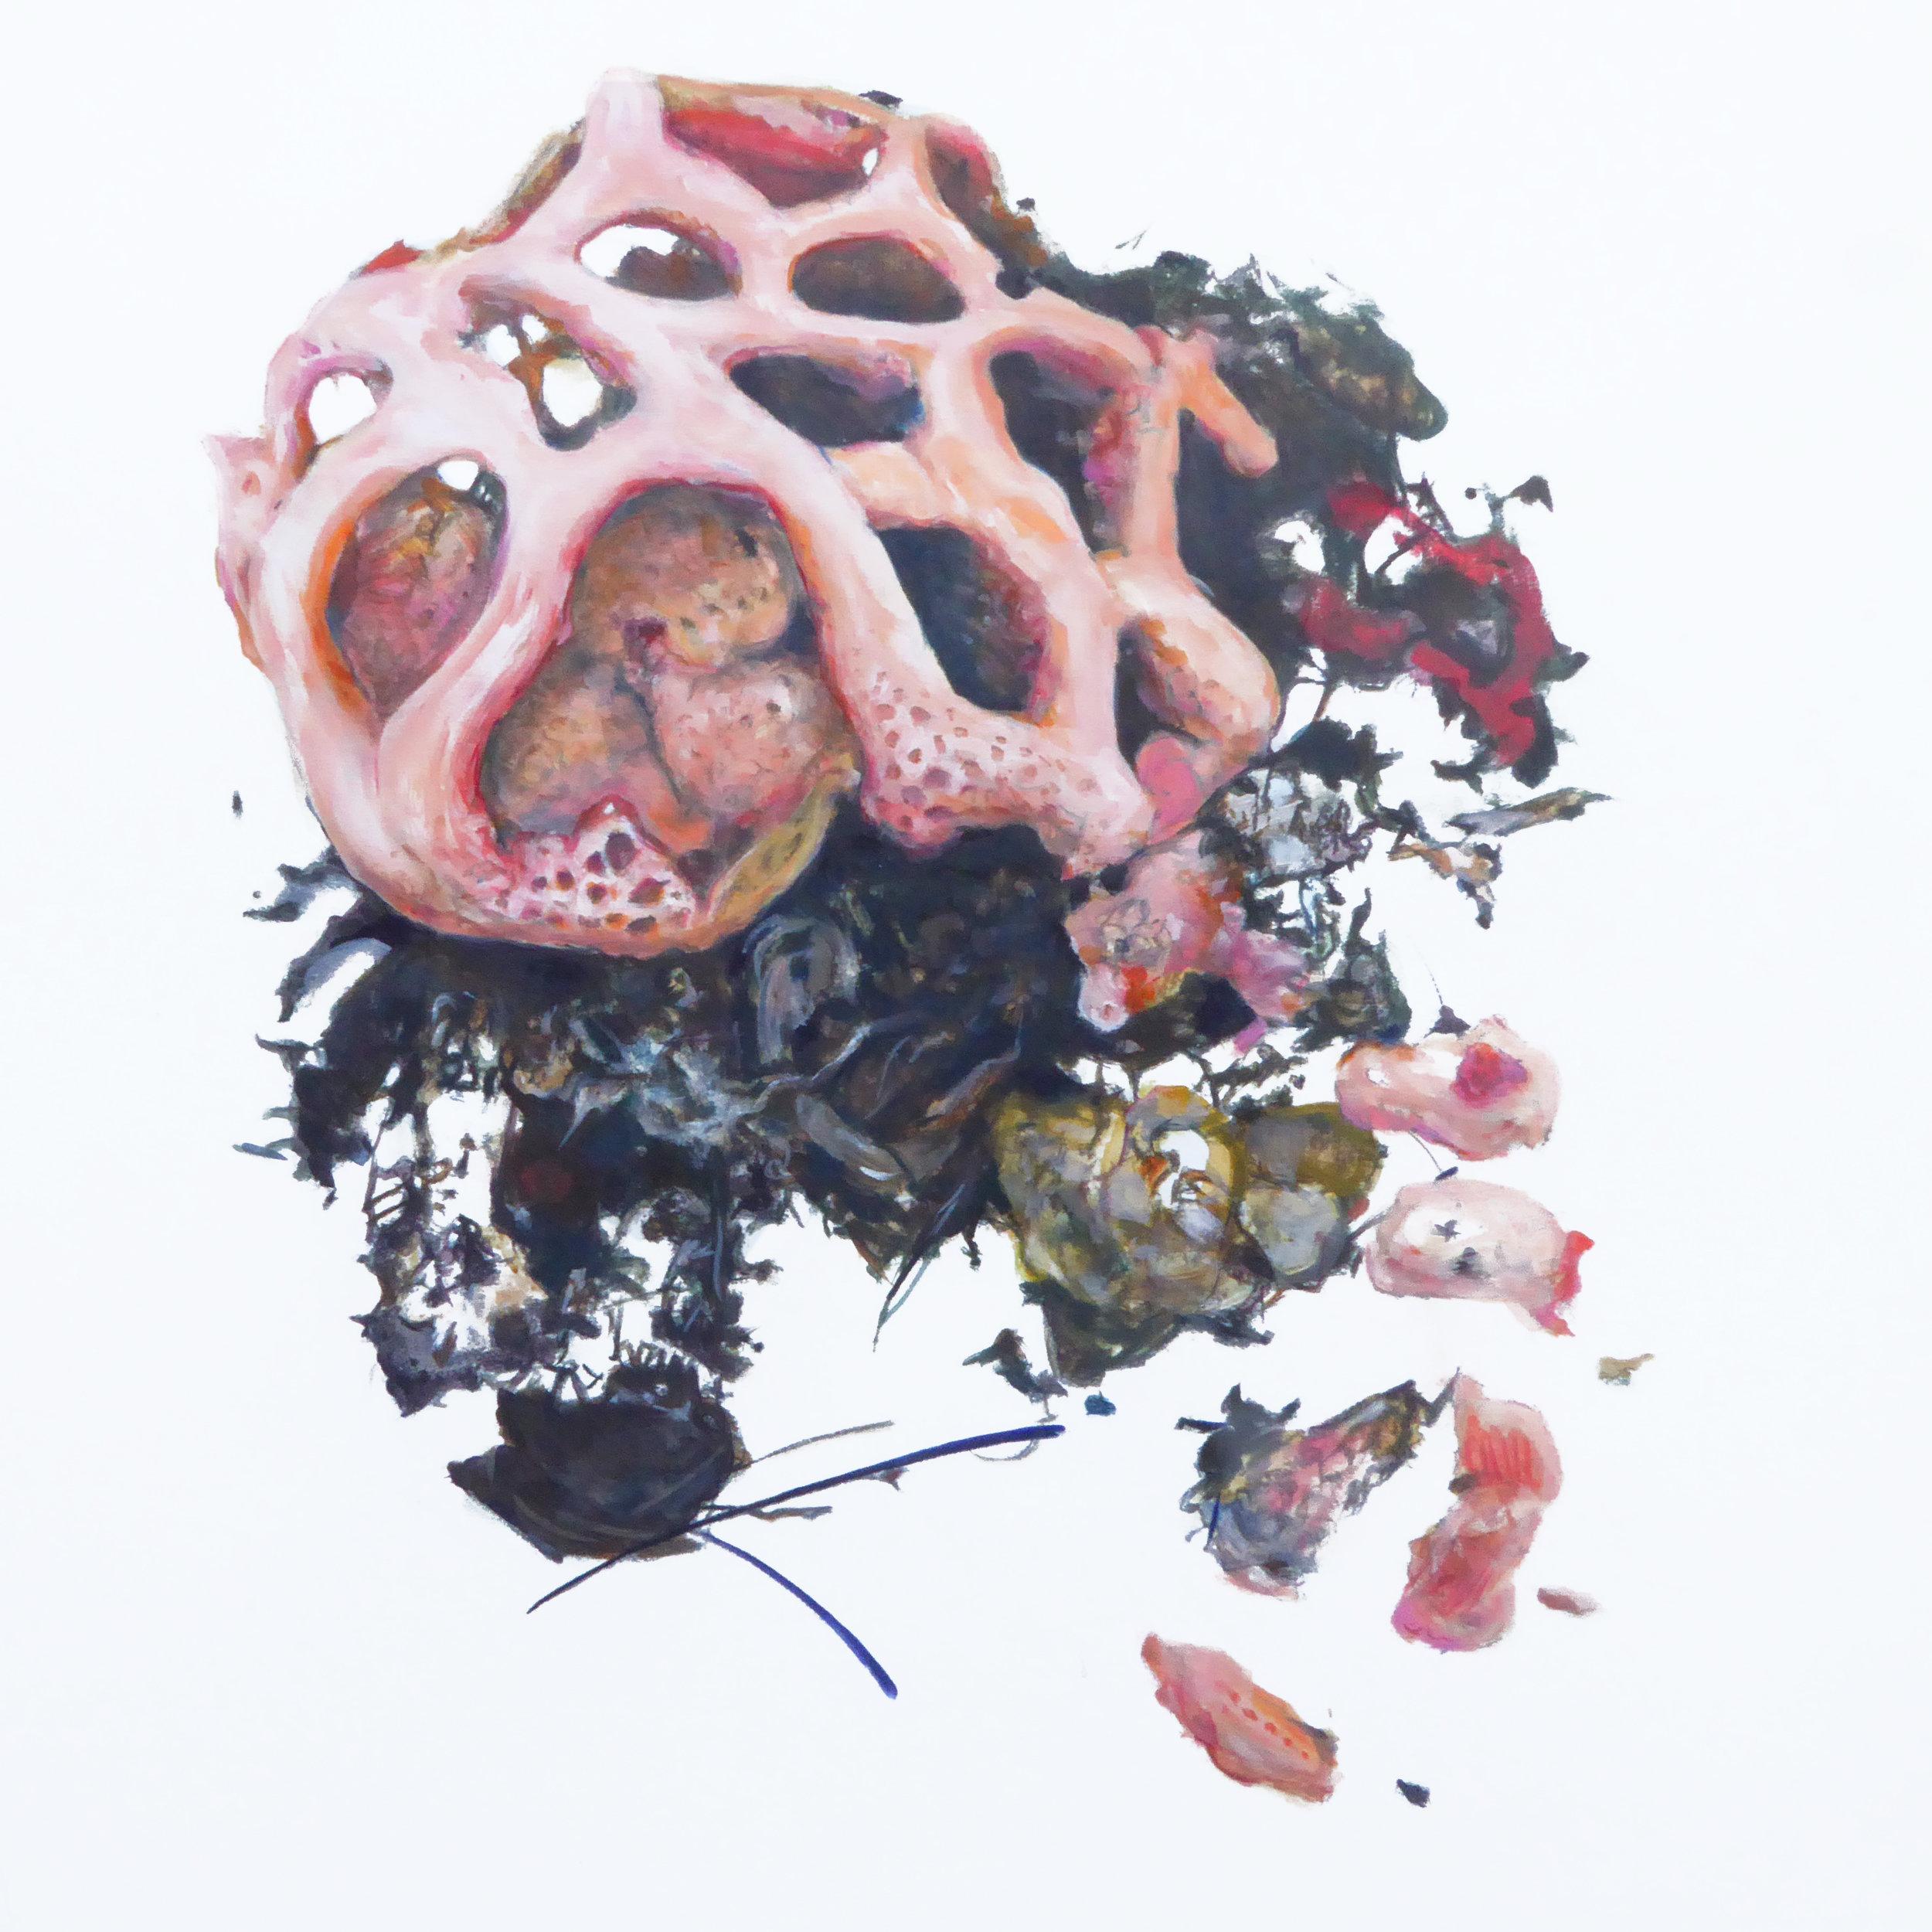 Lattice Stinkhorn Mushroom